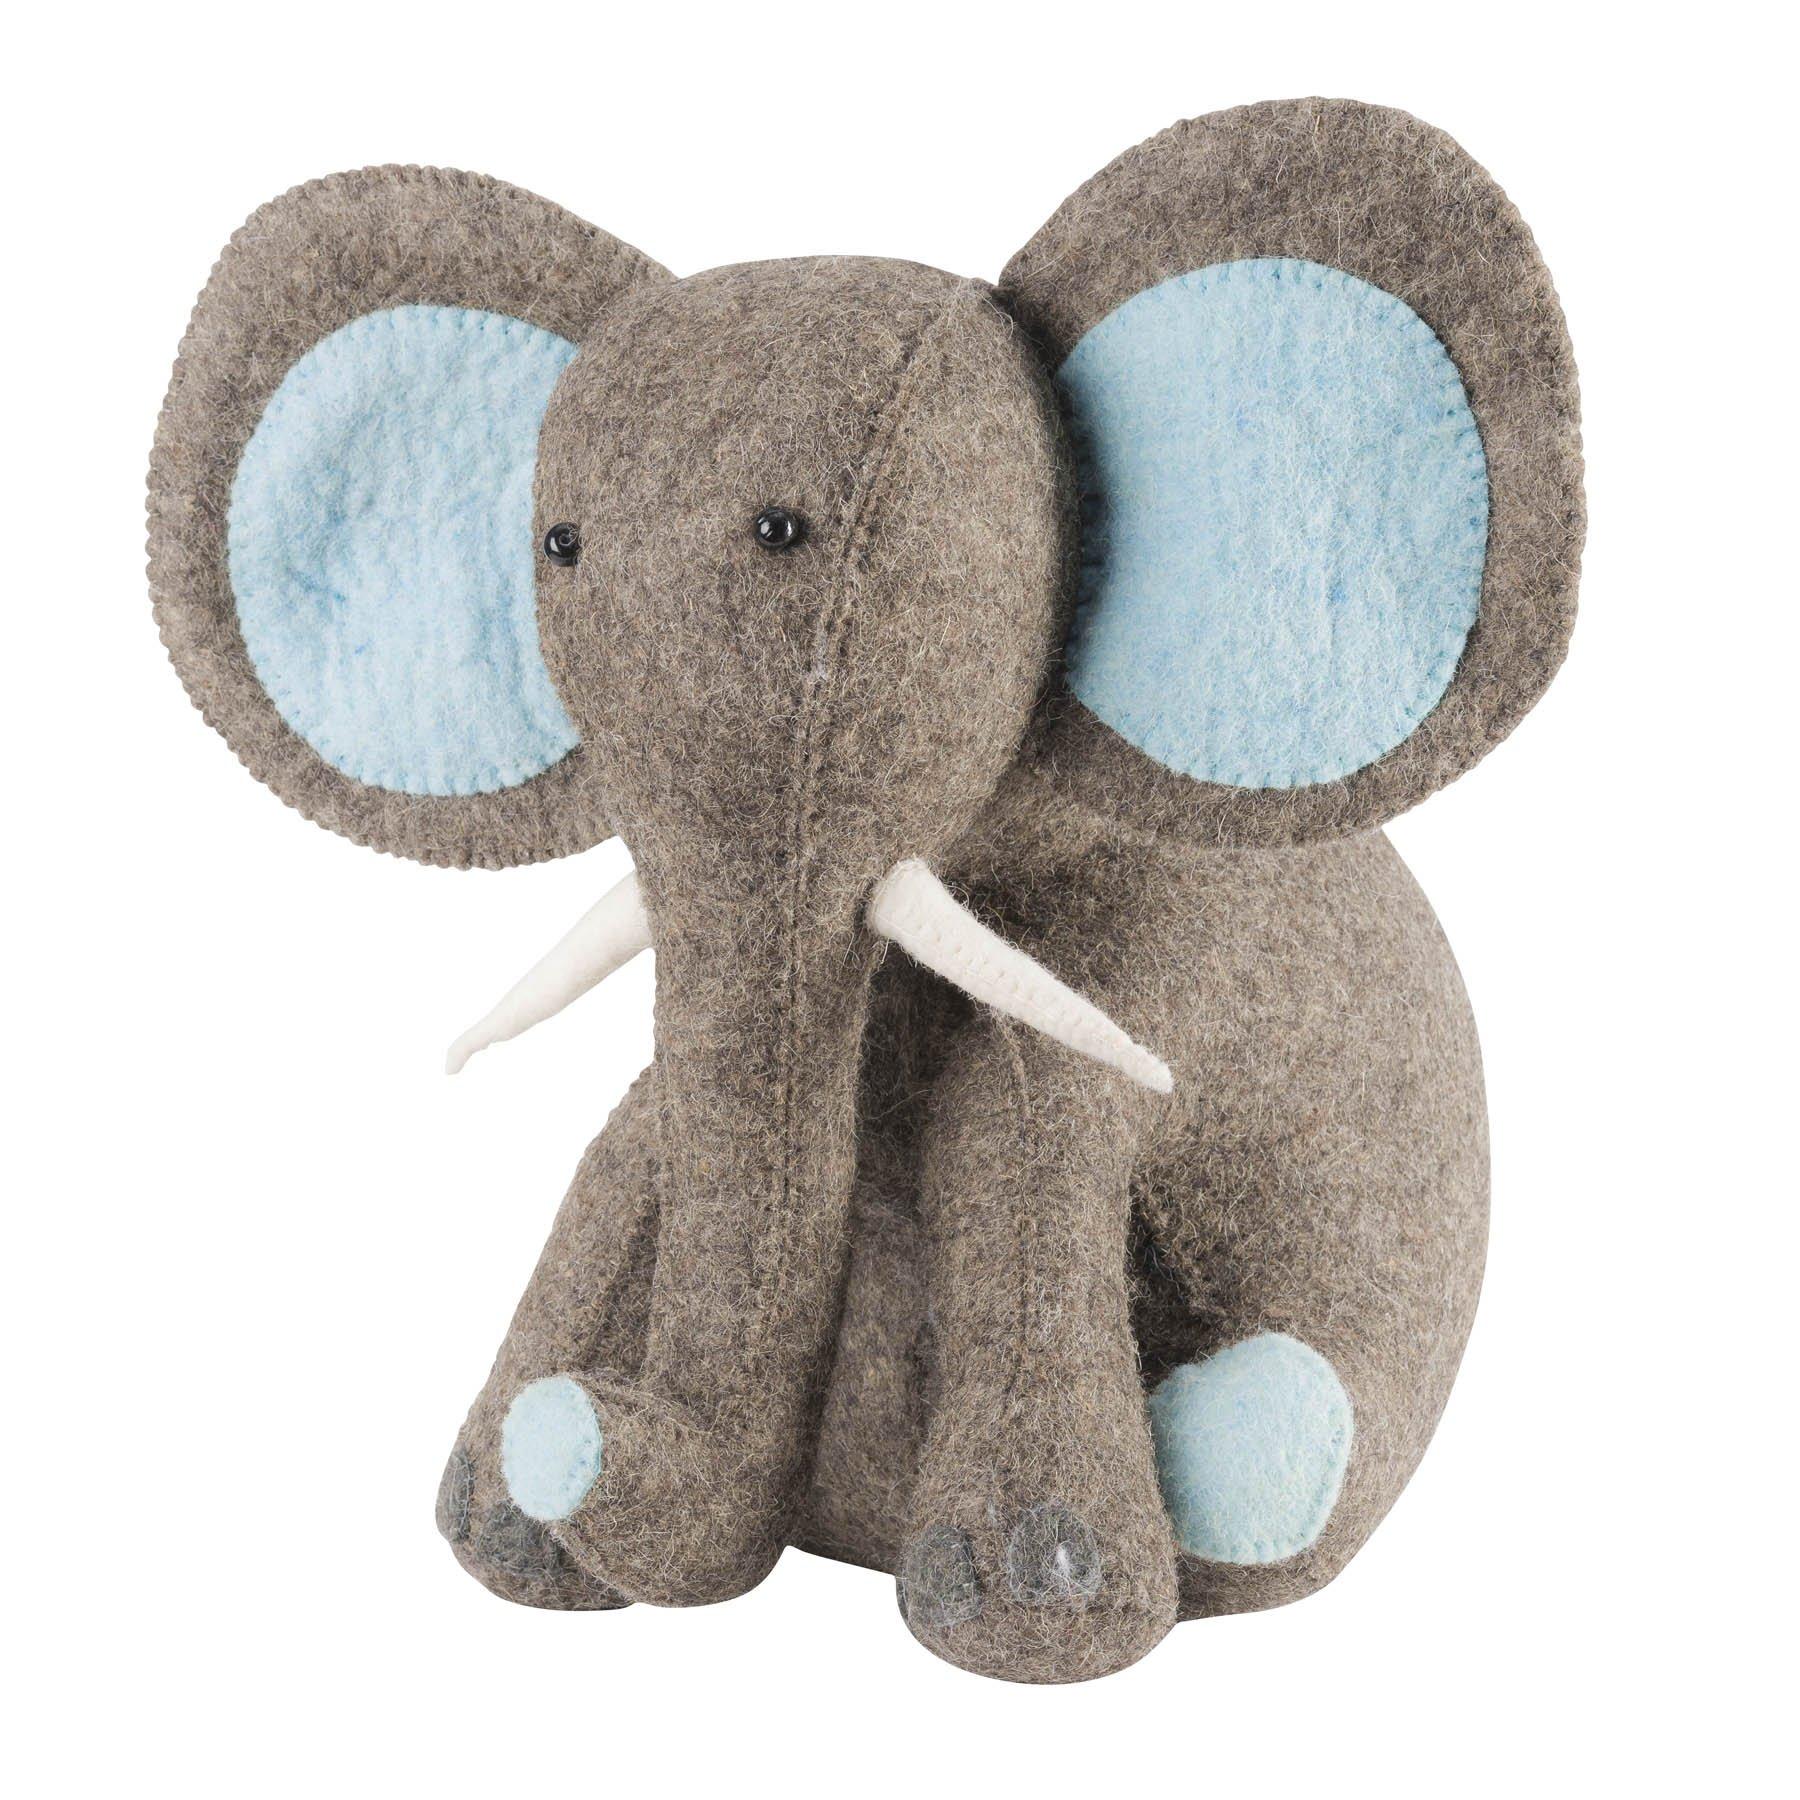 ARCADIA HOME Elephant in Hand Felted Wool Door Stop, Blue